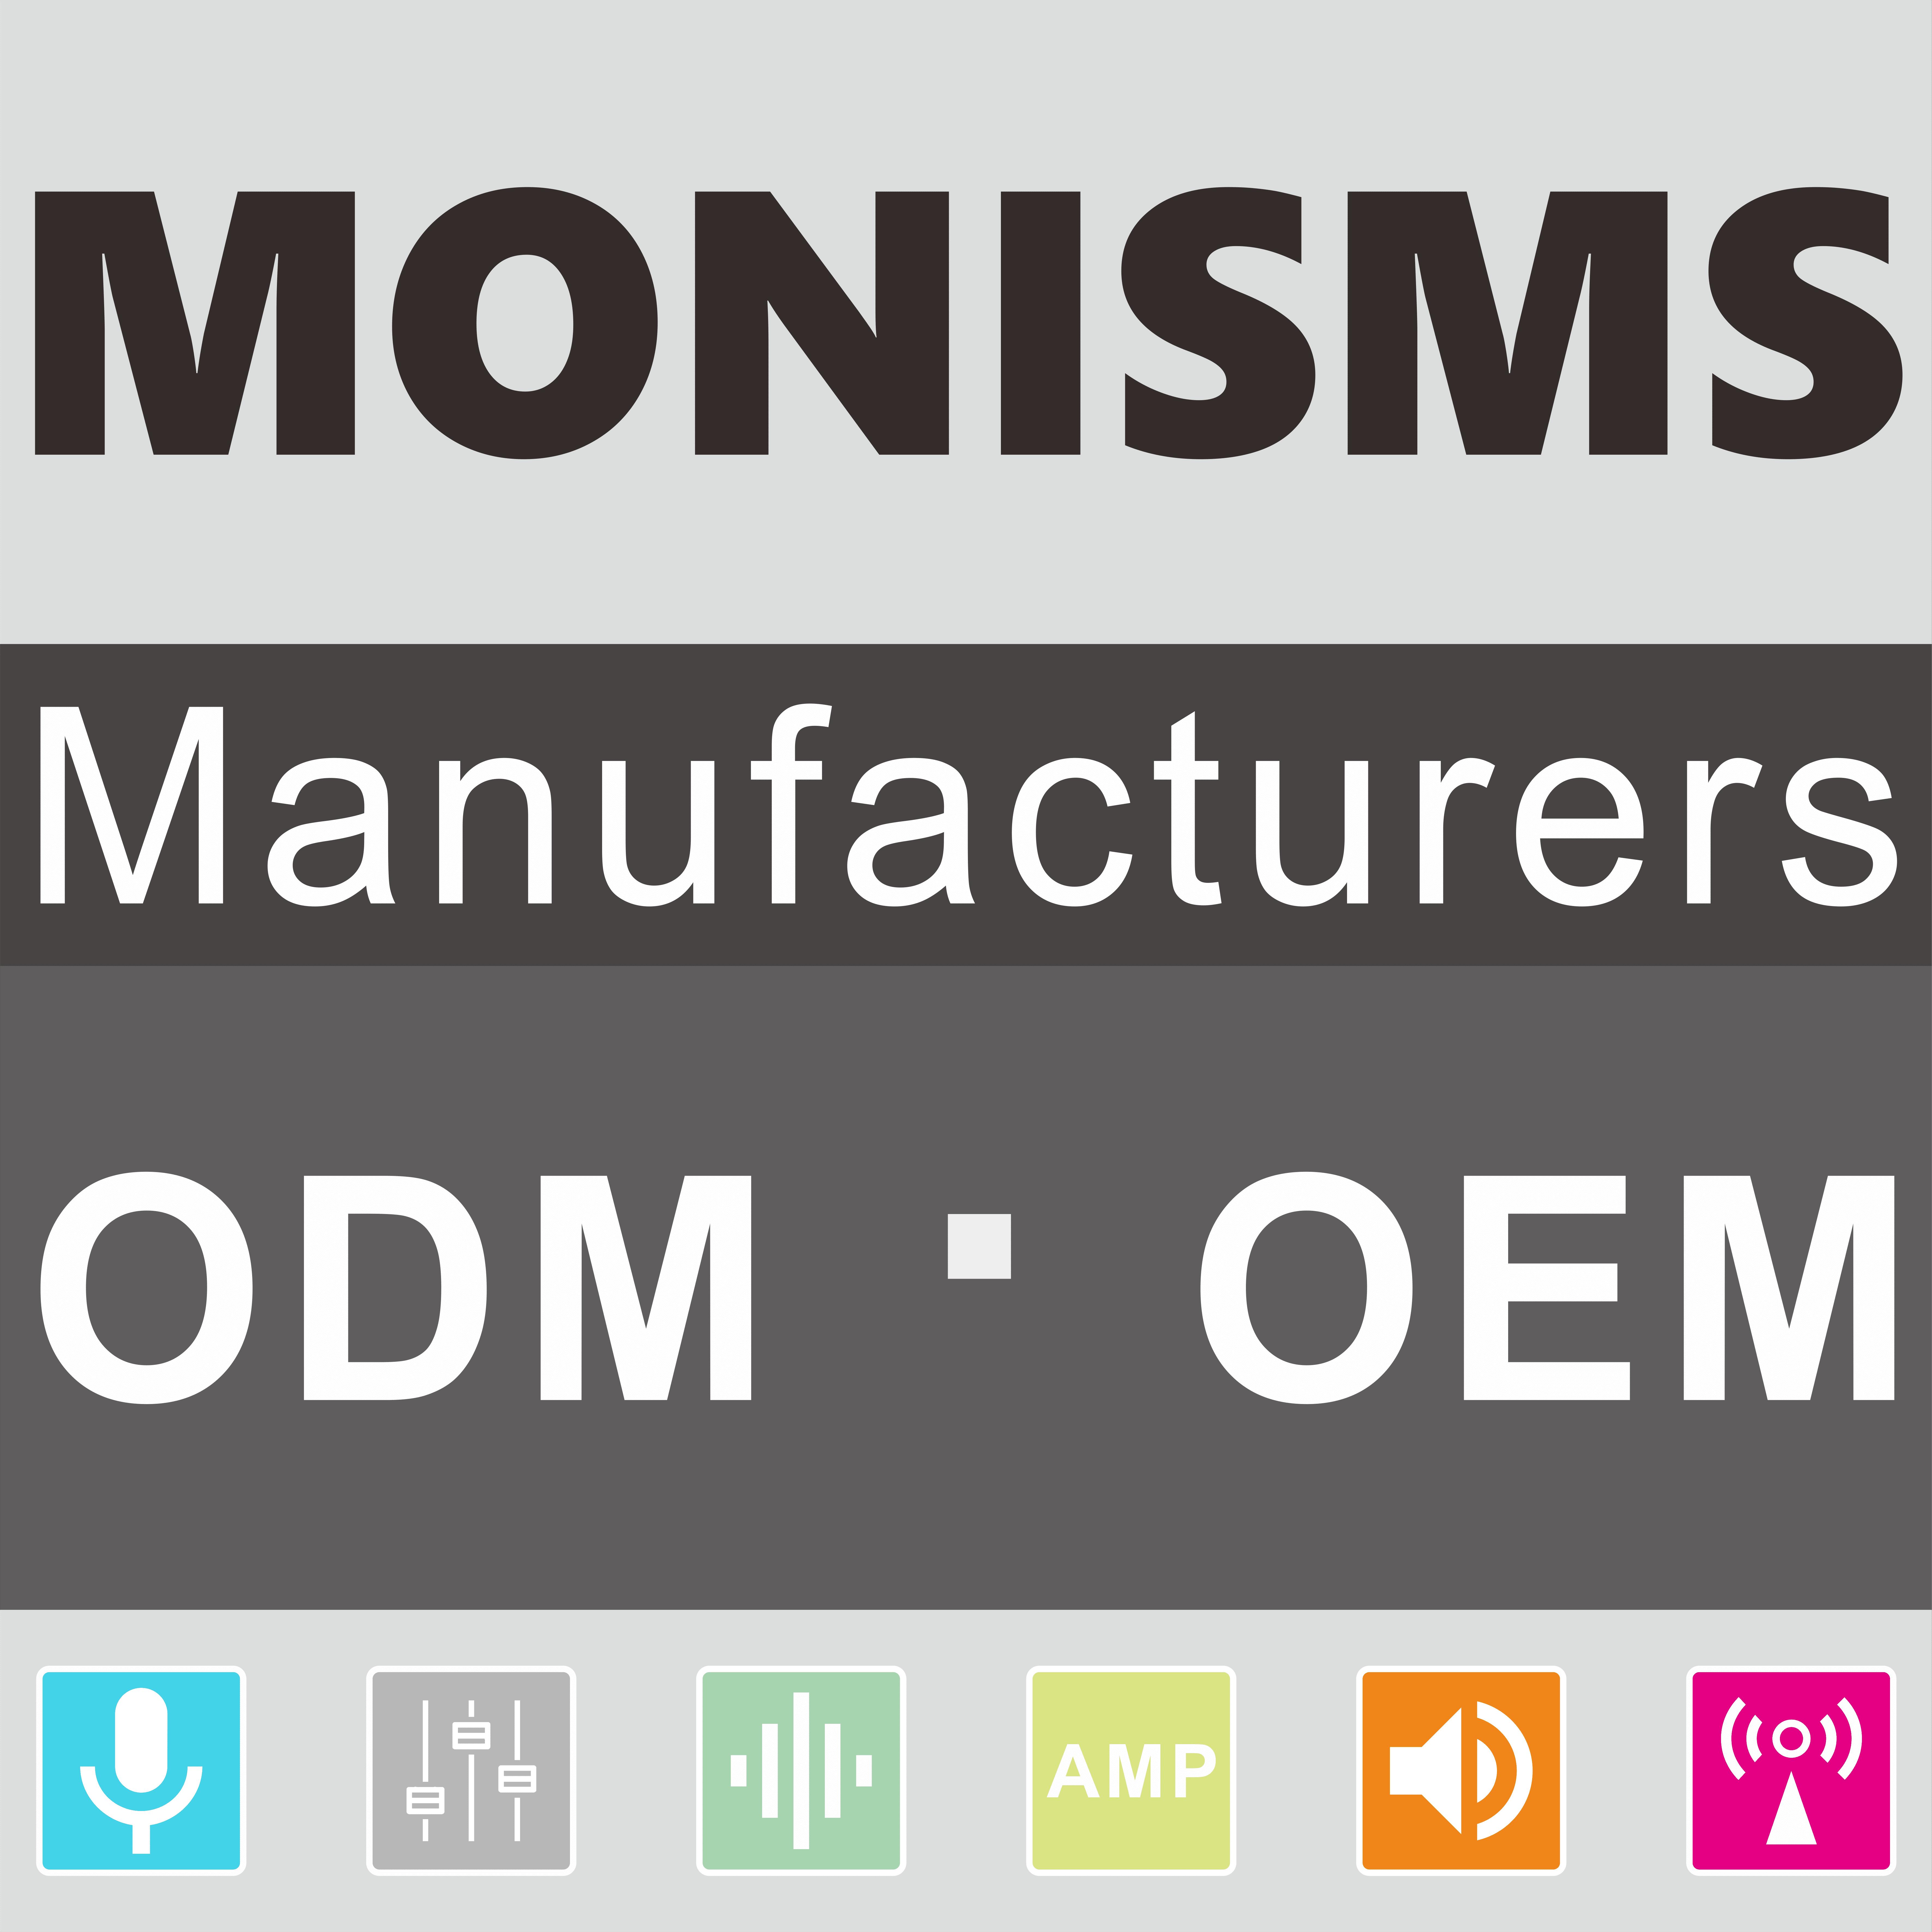 MONISMS